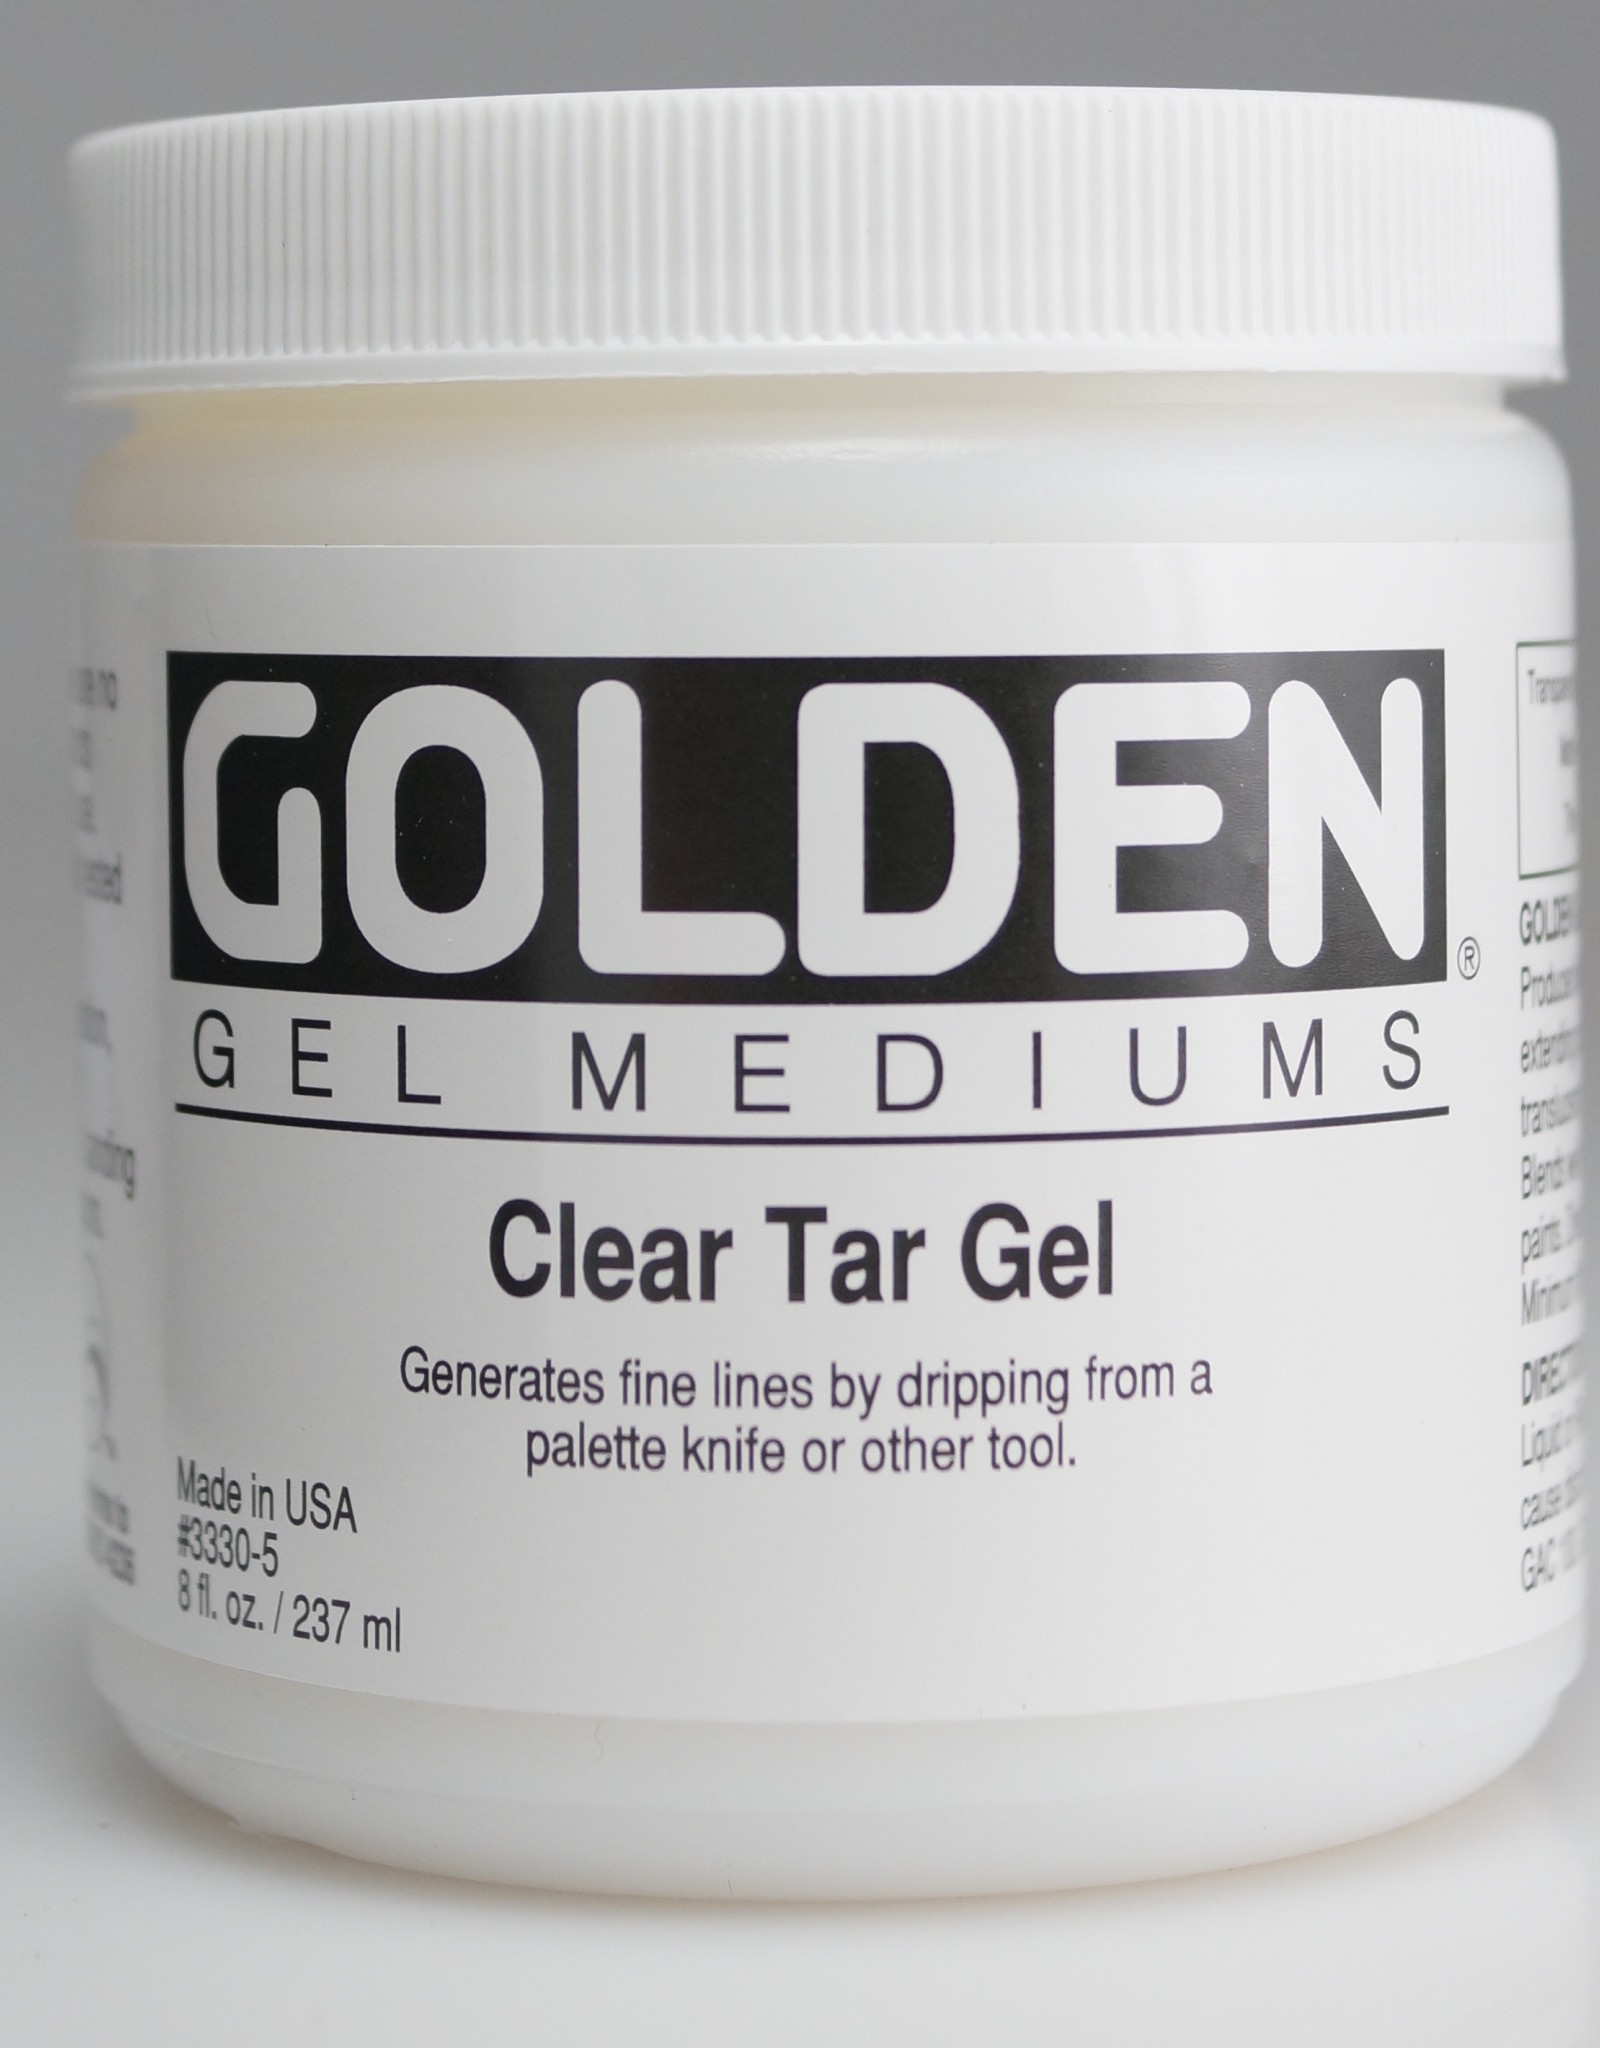 Golden, Clear Tar Gel, Medium  8 oz Jar